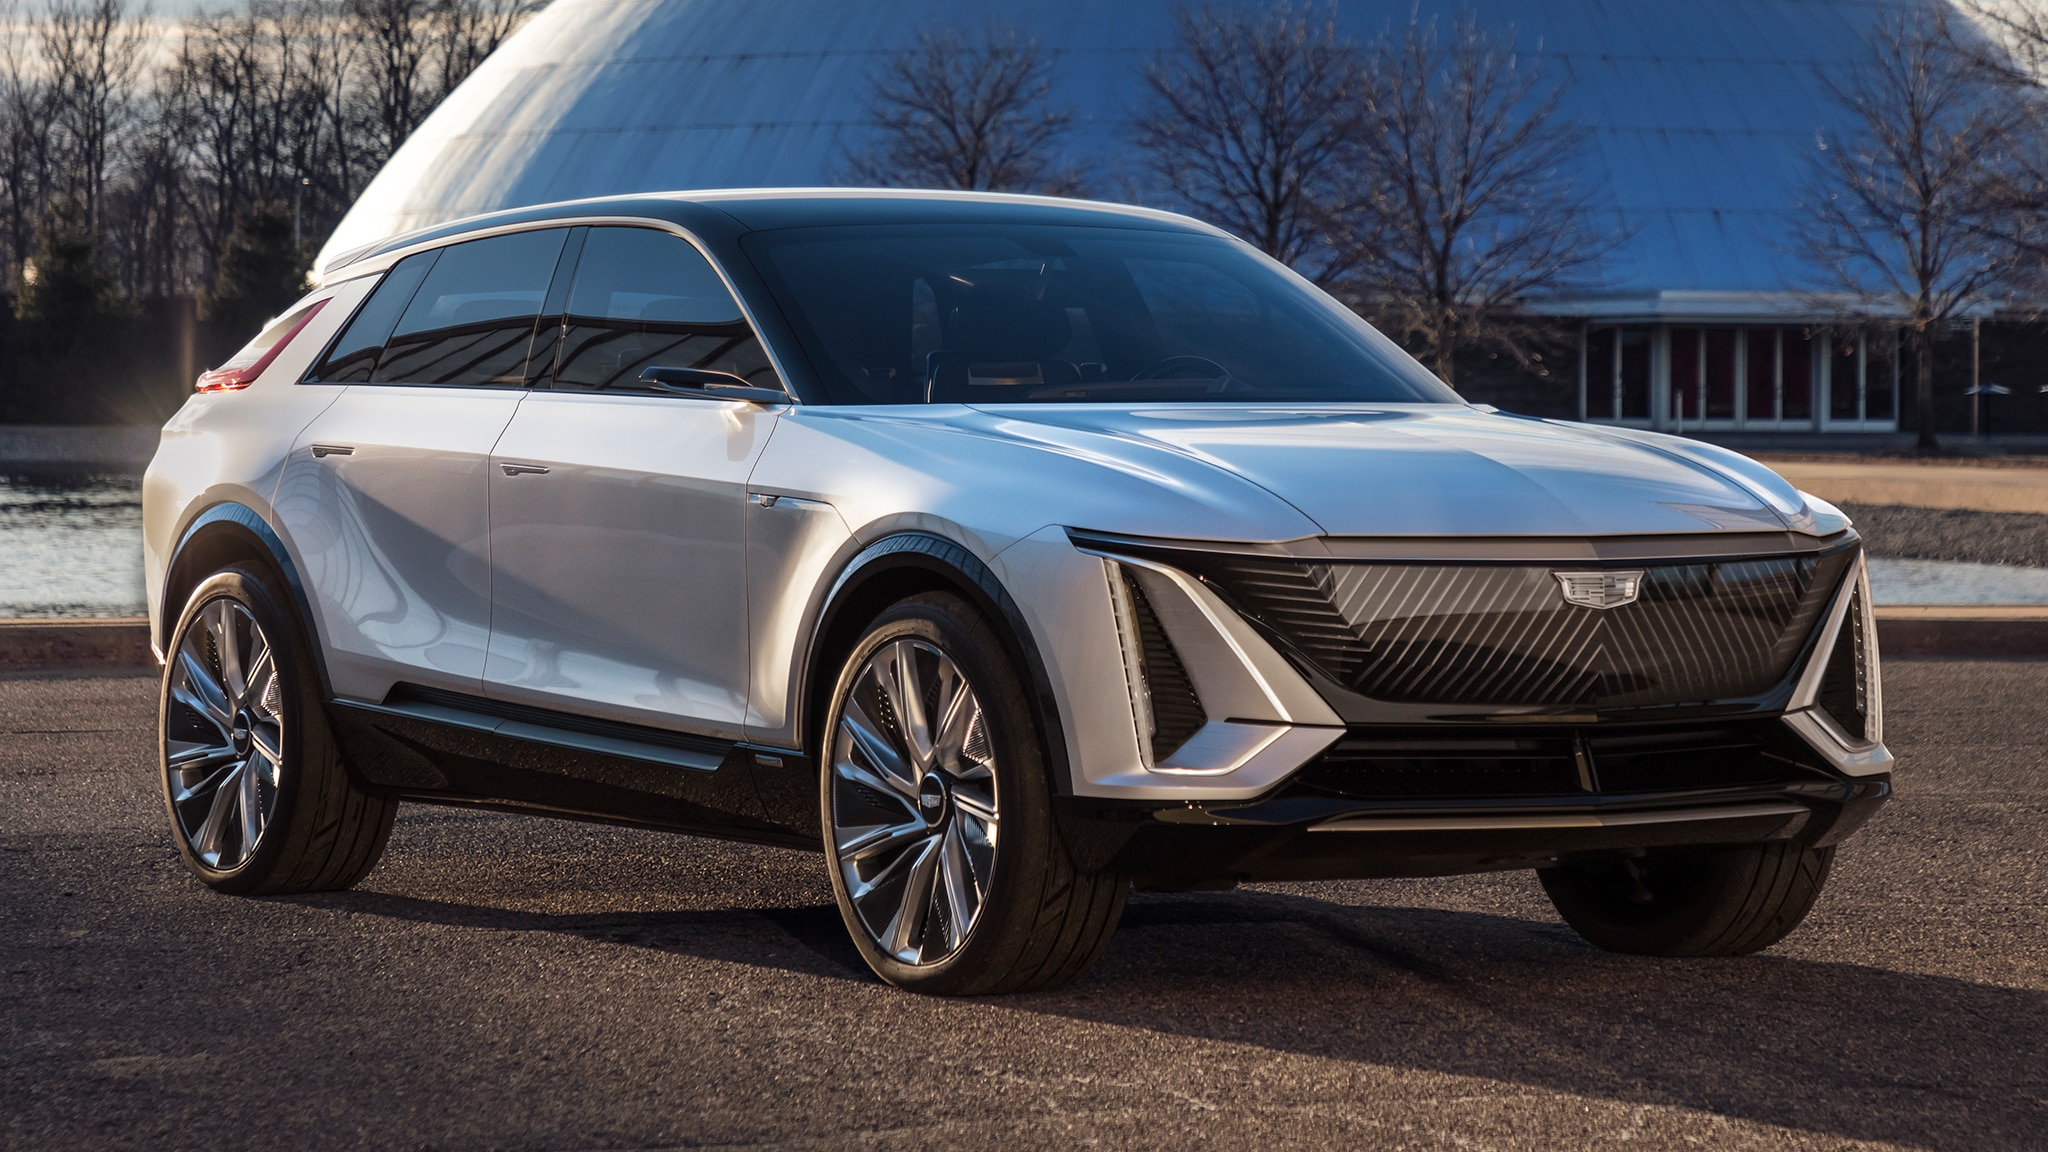 2023 Cadillac Lyriq Electric SUV Unveiled